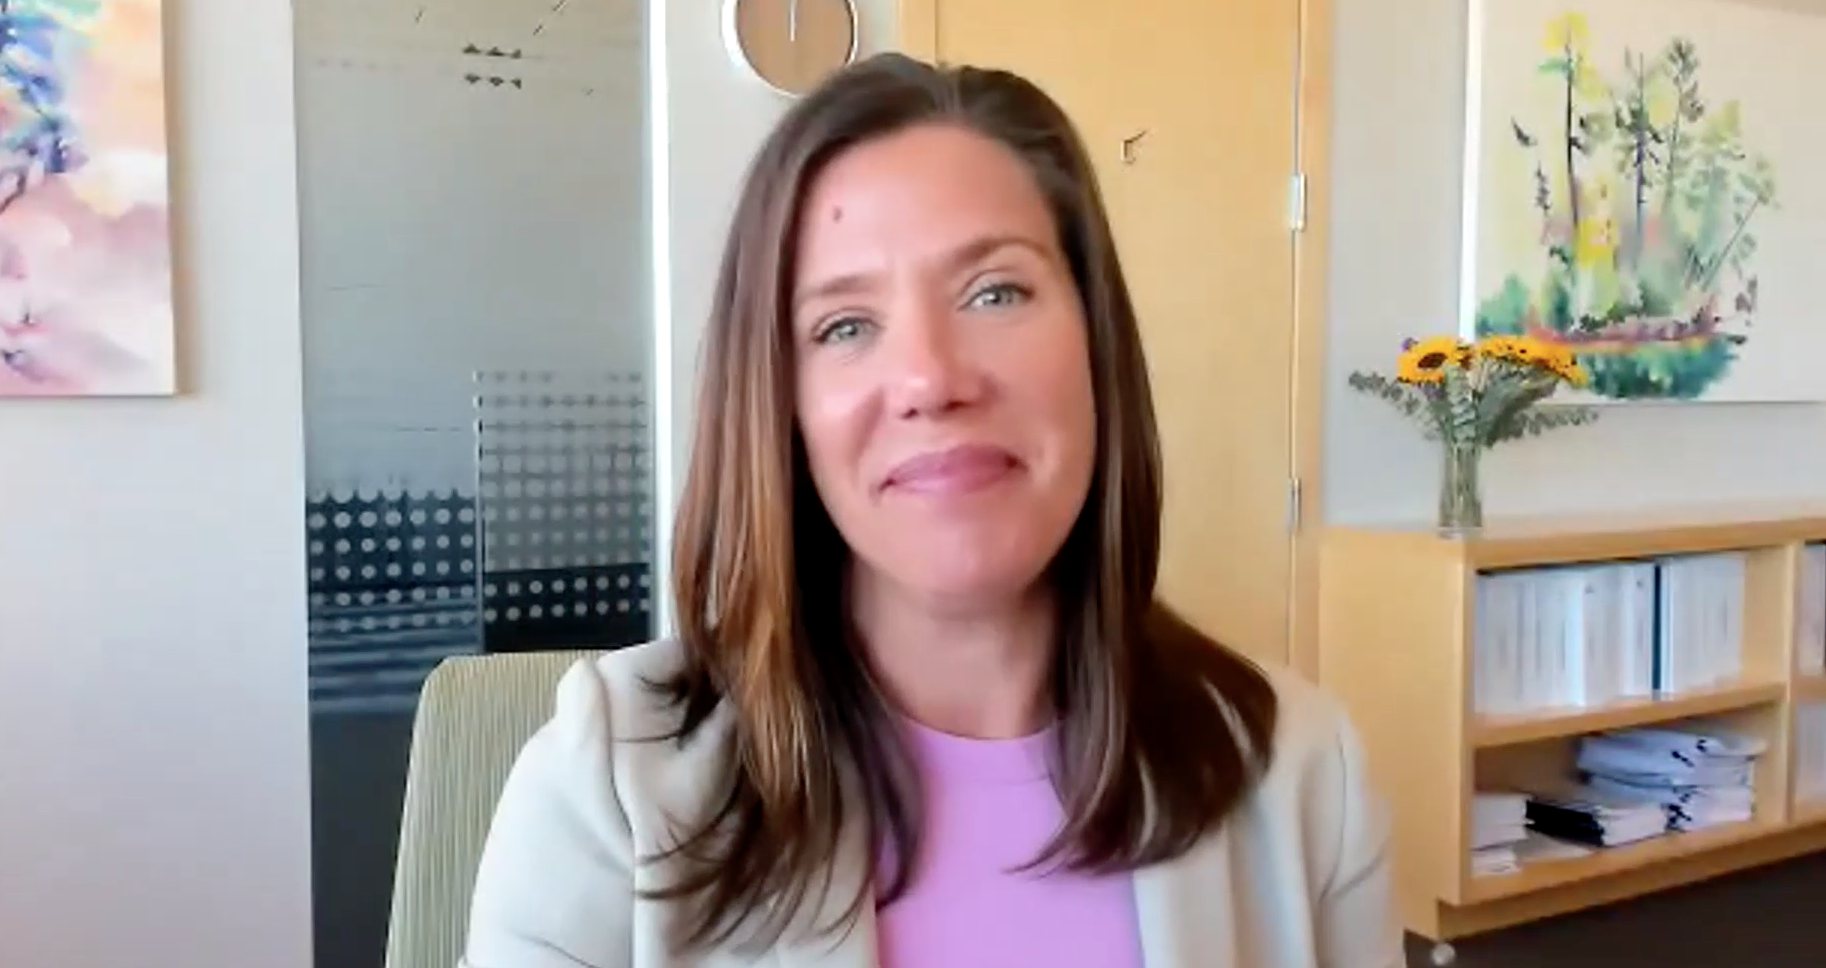 Diversity Efforts, Work-Life Balance Top Priority List for Women Execs in MN